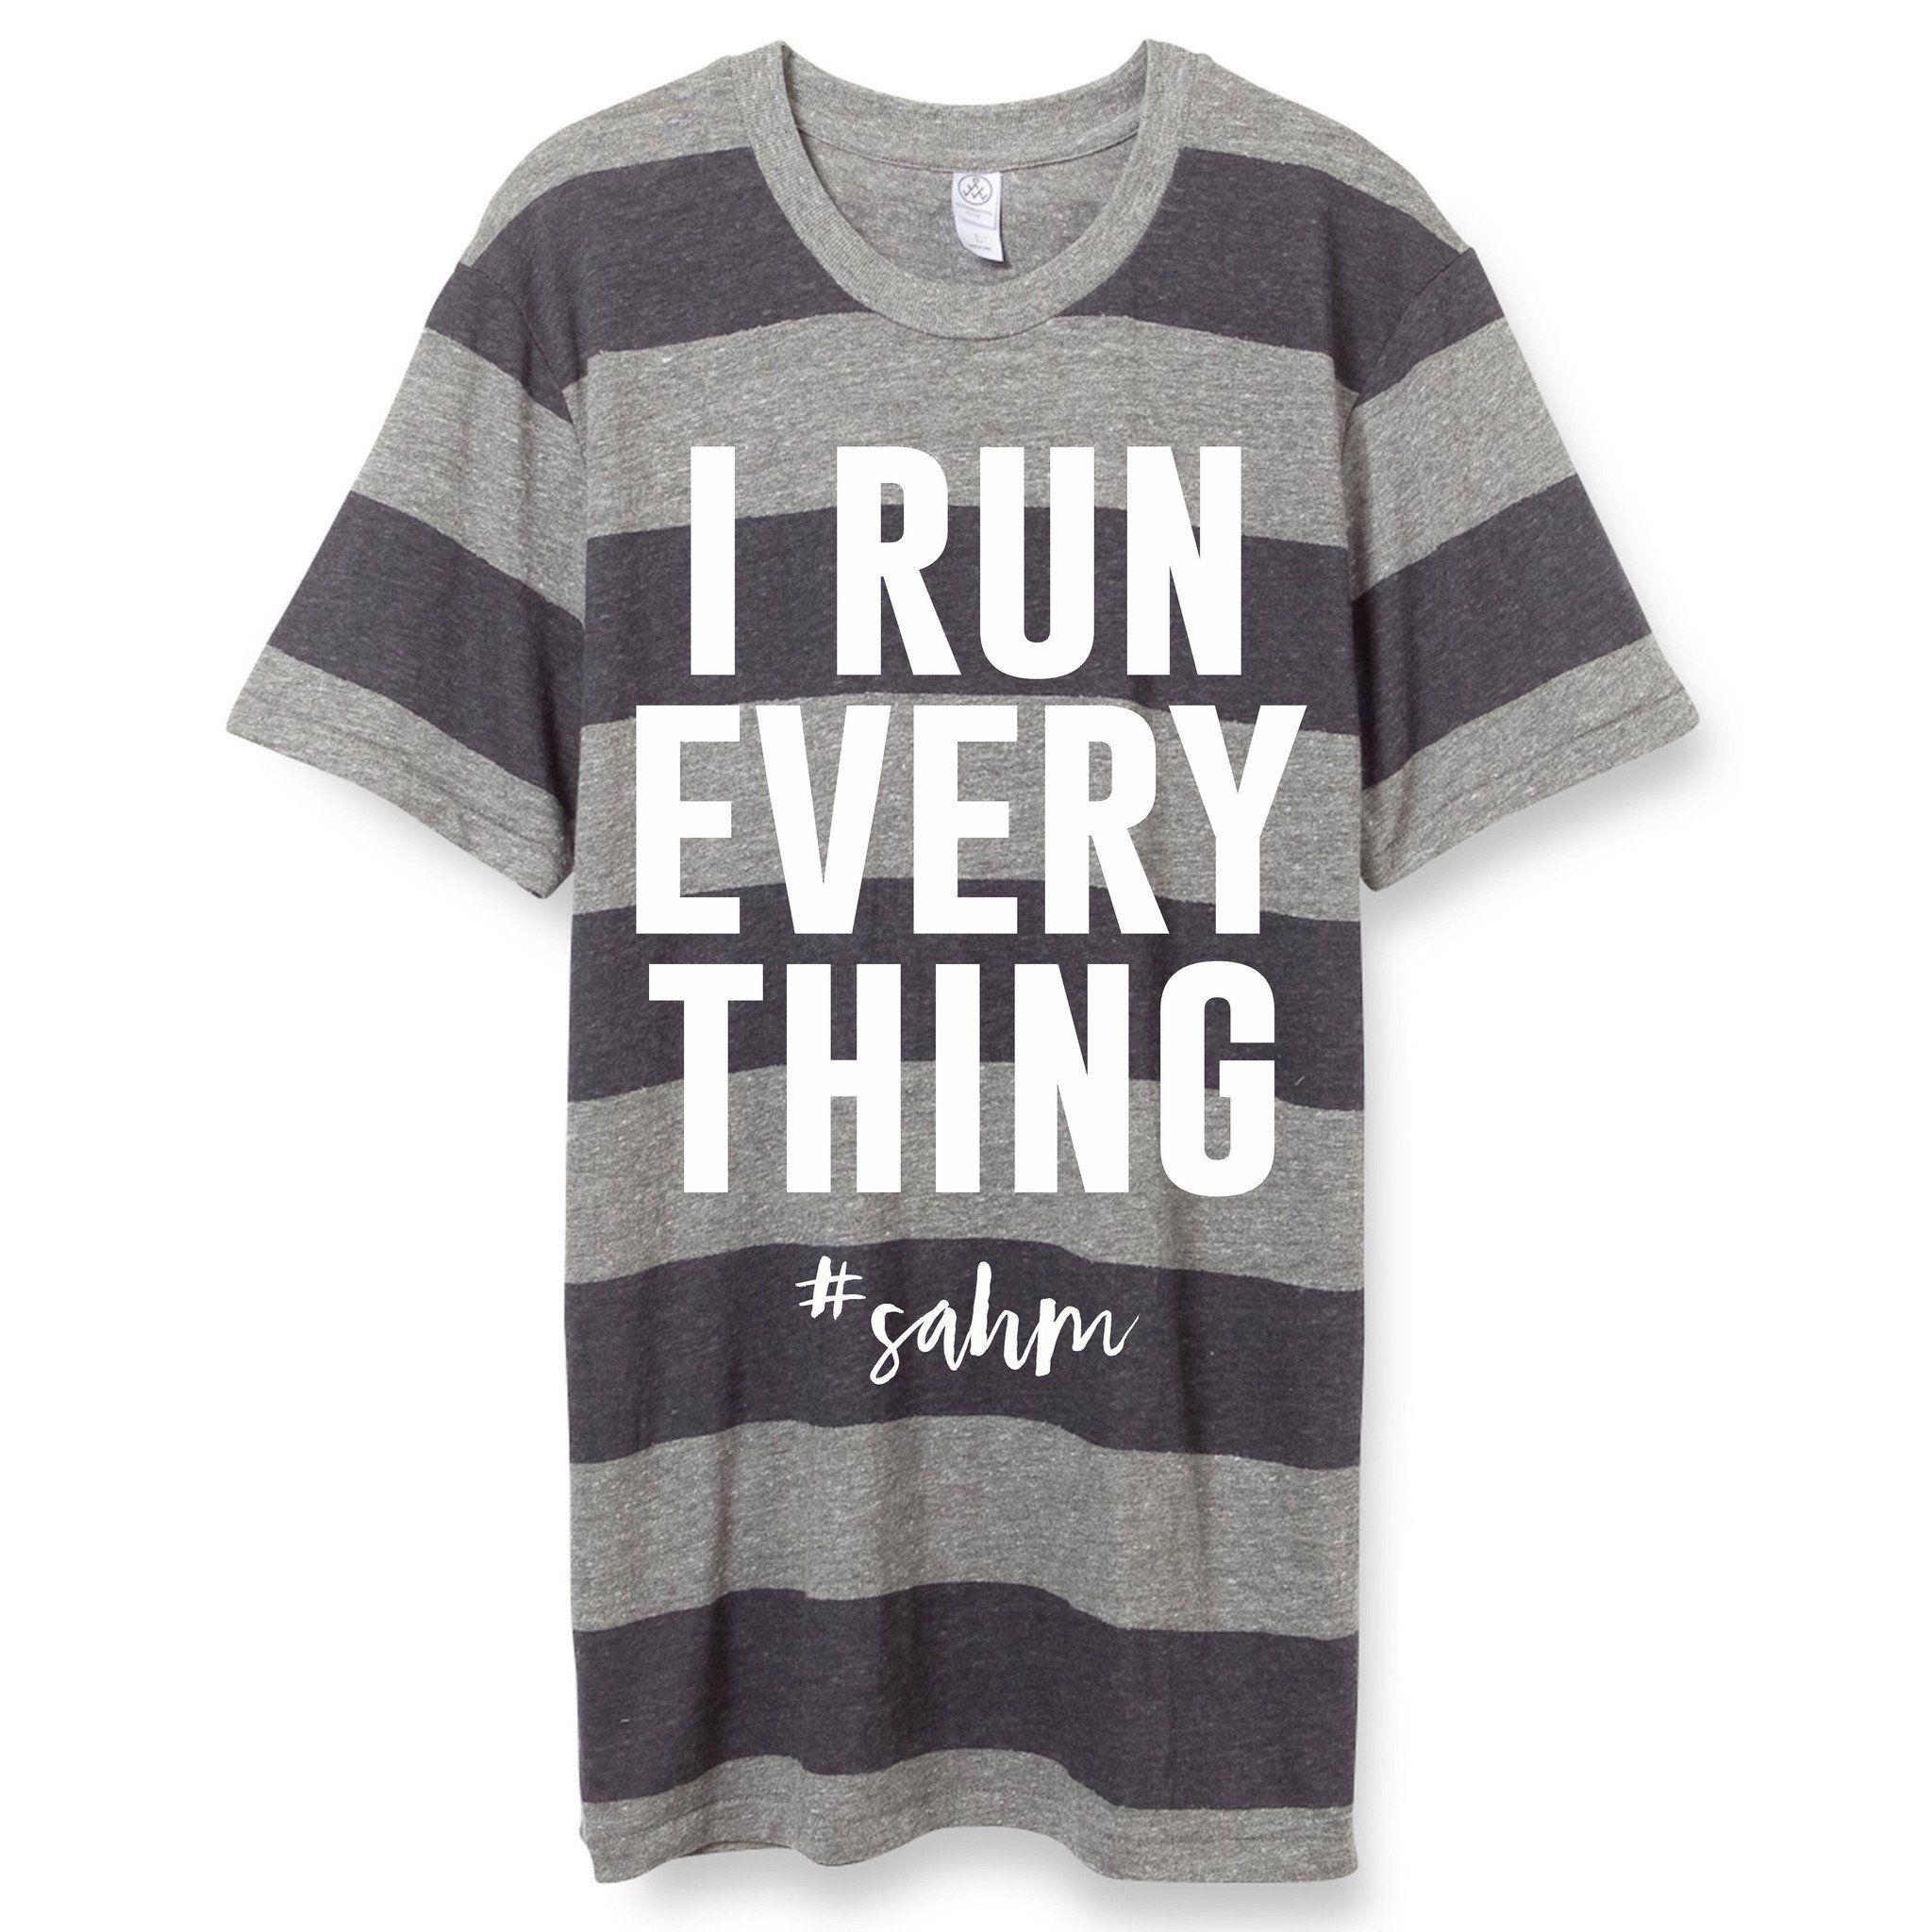 I RUN EVERYTHING #sahm Tee | Work at home mom | Pinterest